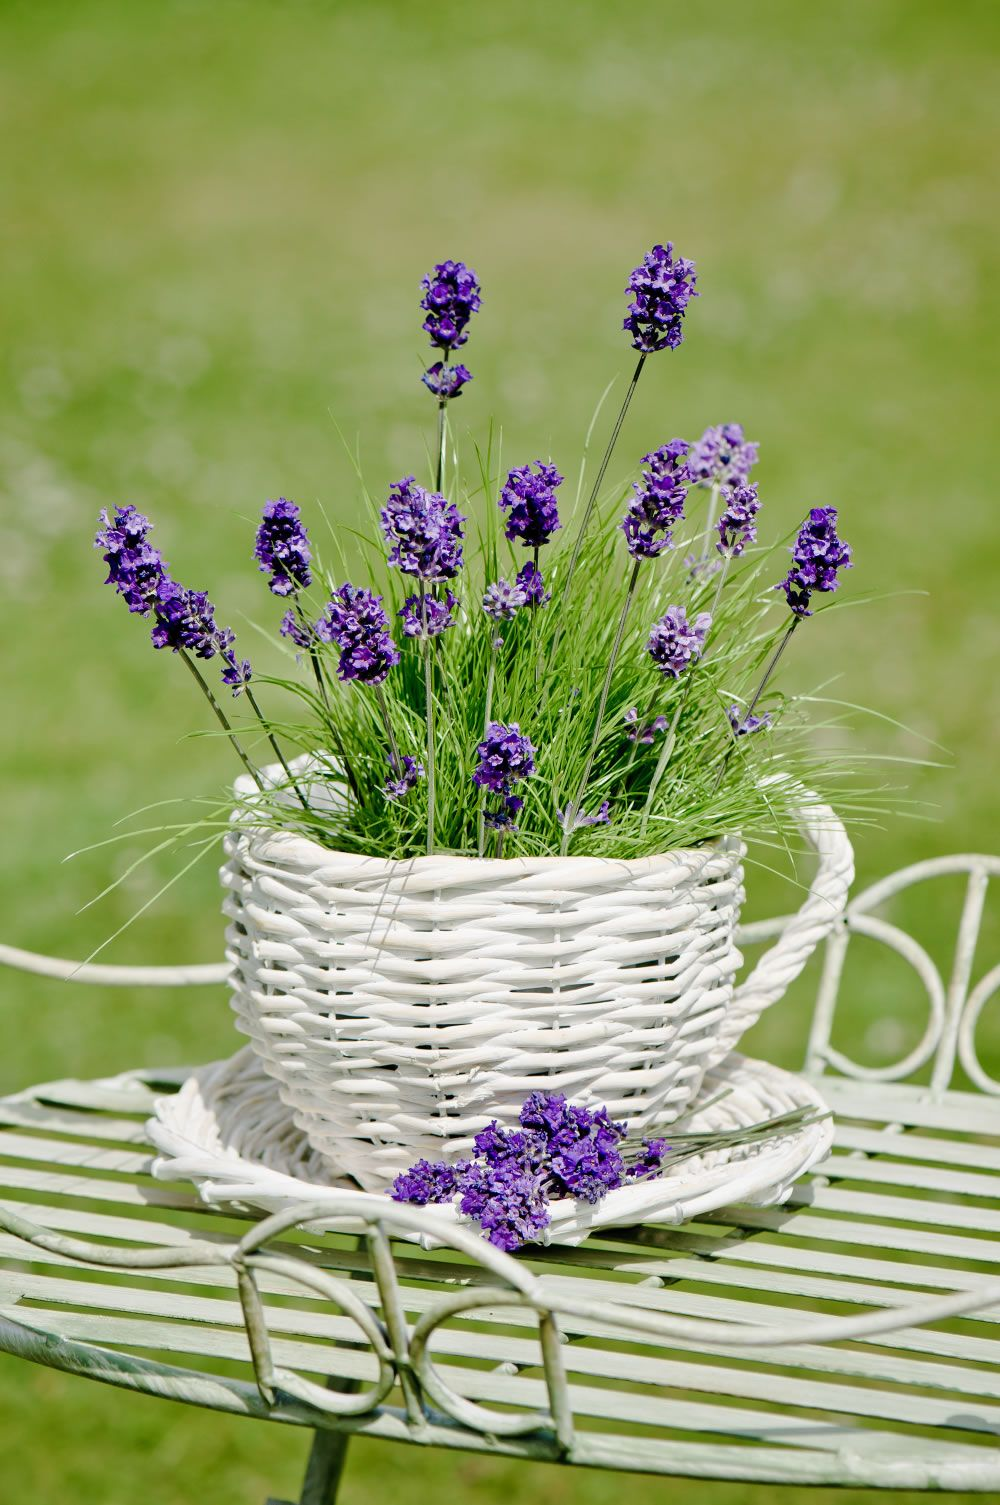 lavendel im garten oder auf dem balkon pflanzen florales. Black Bedroom Furniture Sets. Home Design Ideas